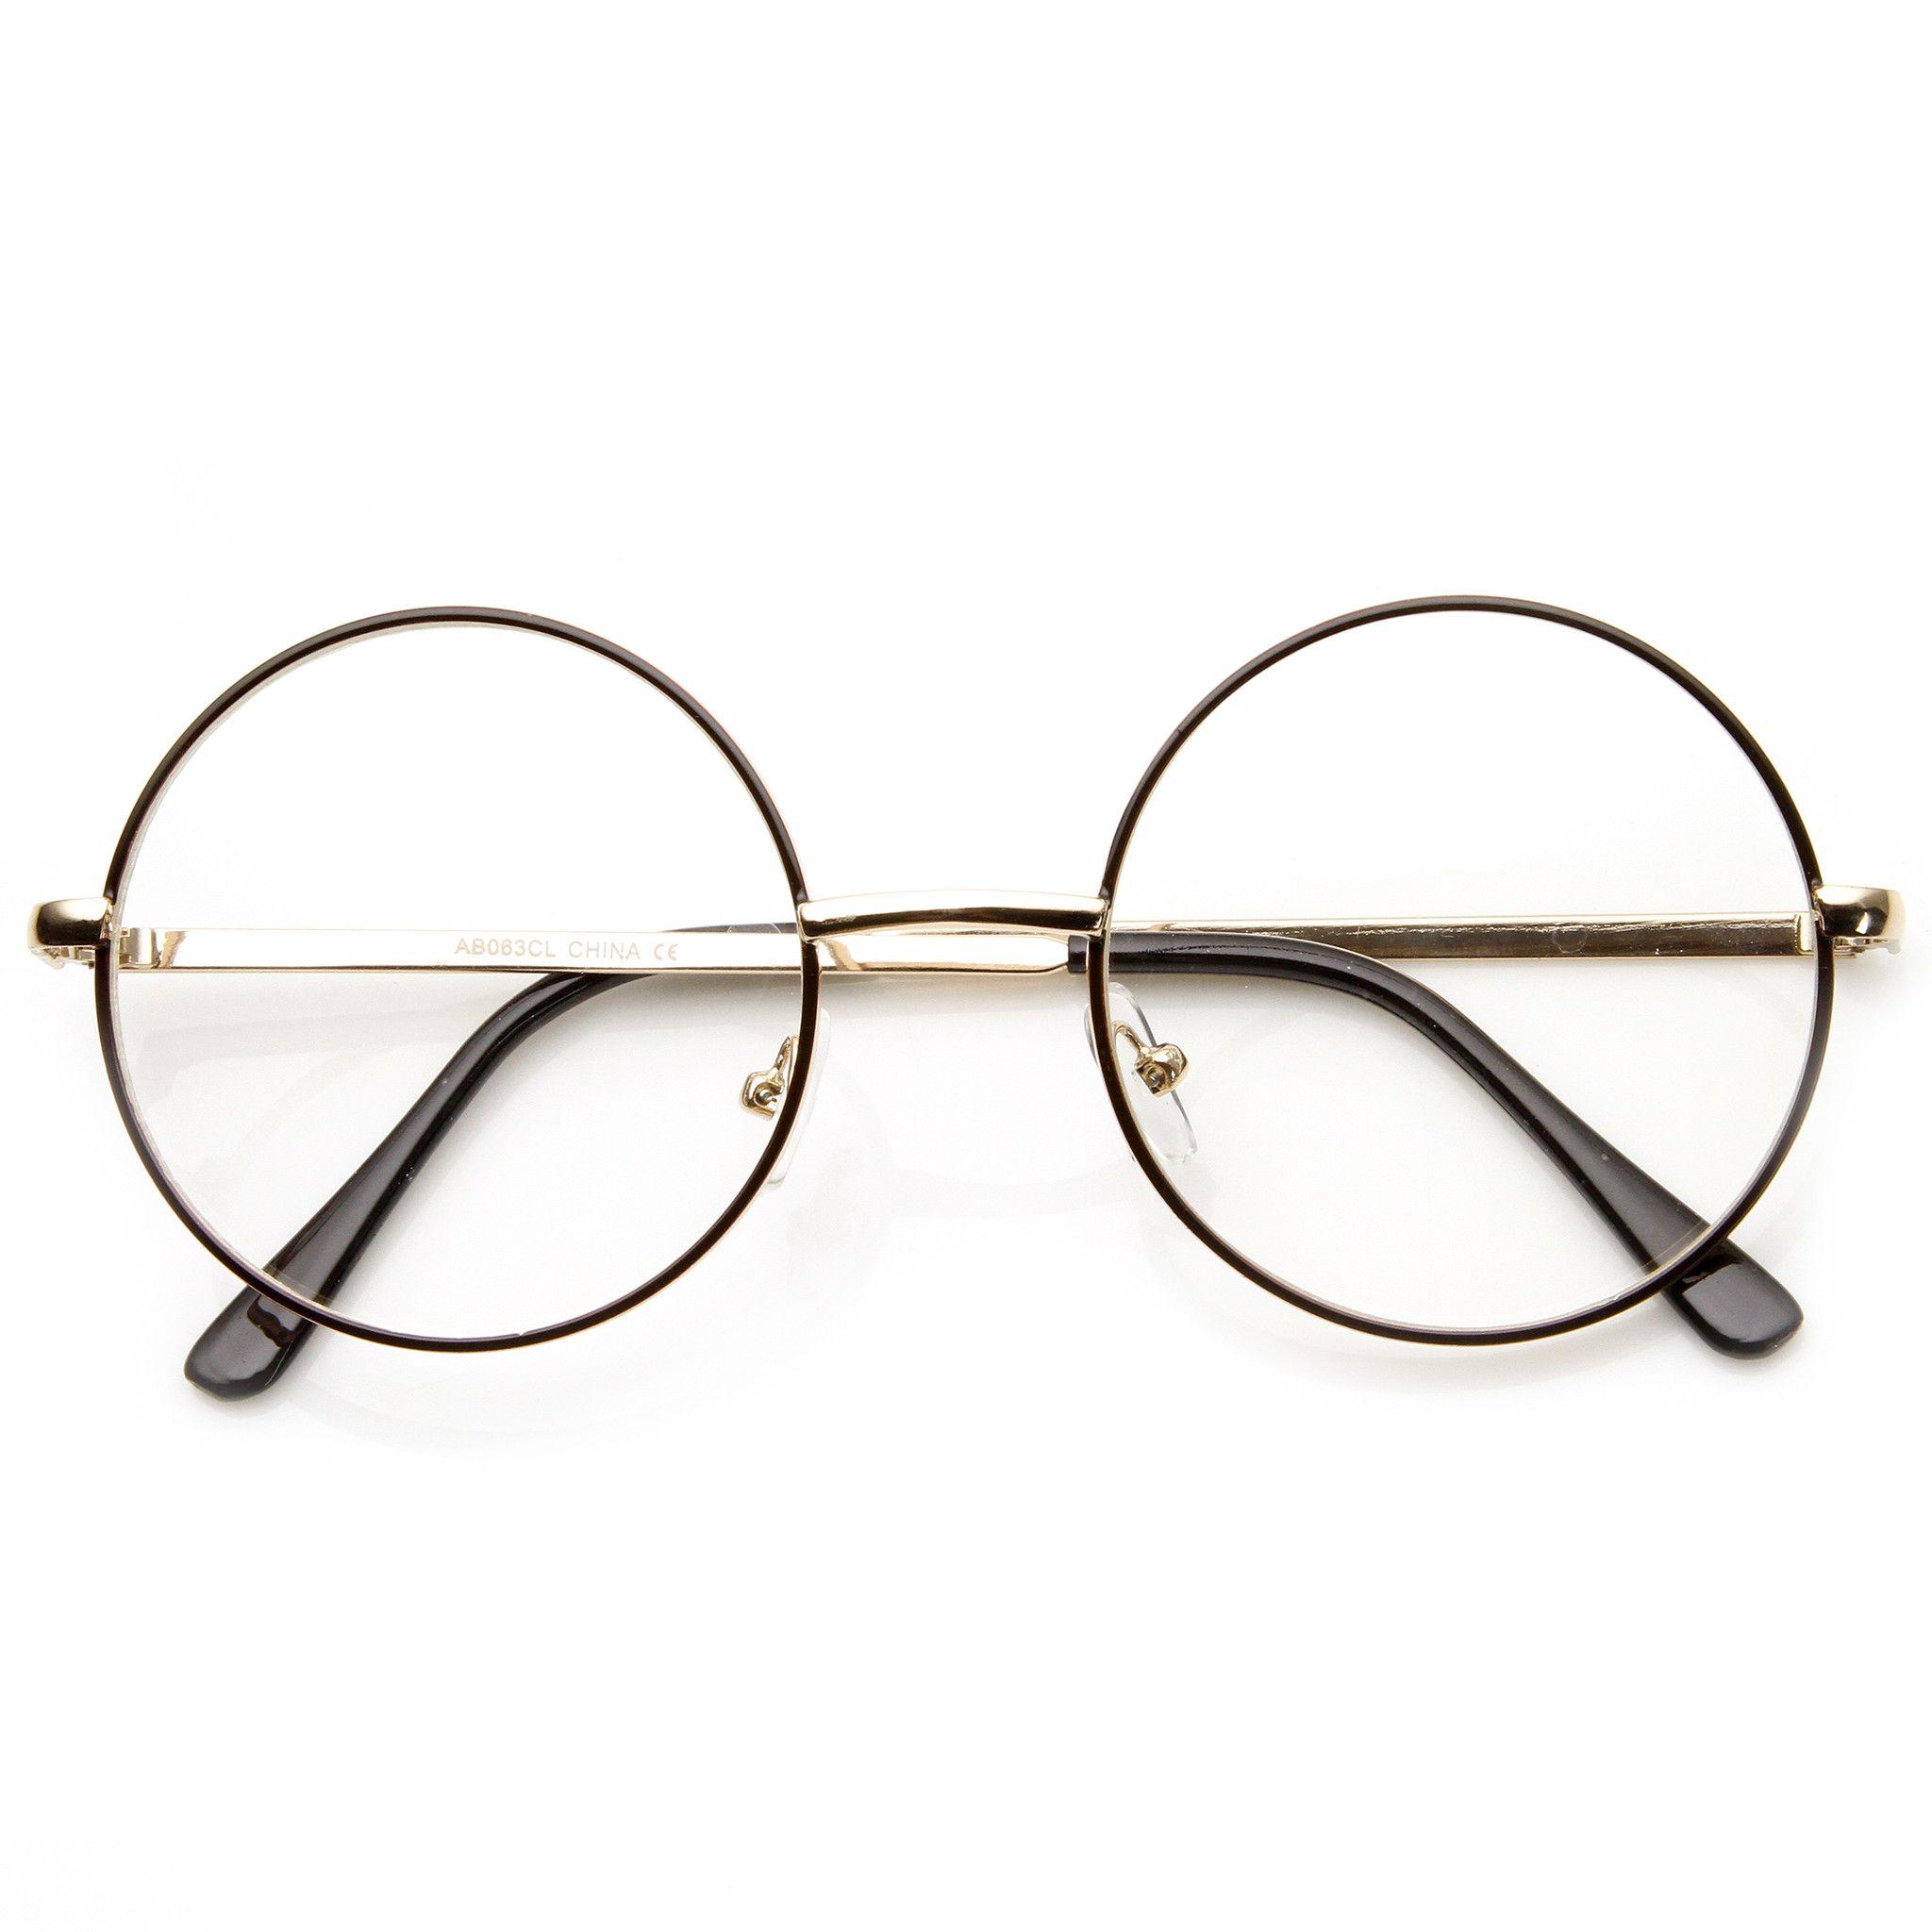 5acd2680562 Vintage Round Prescription Glasses